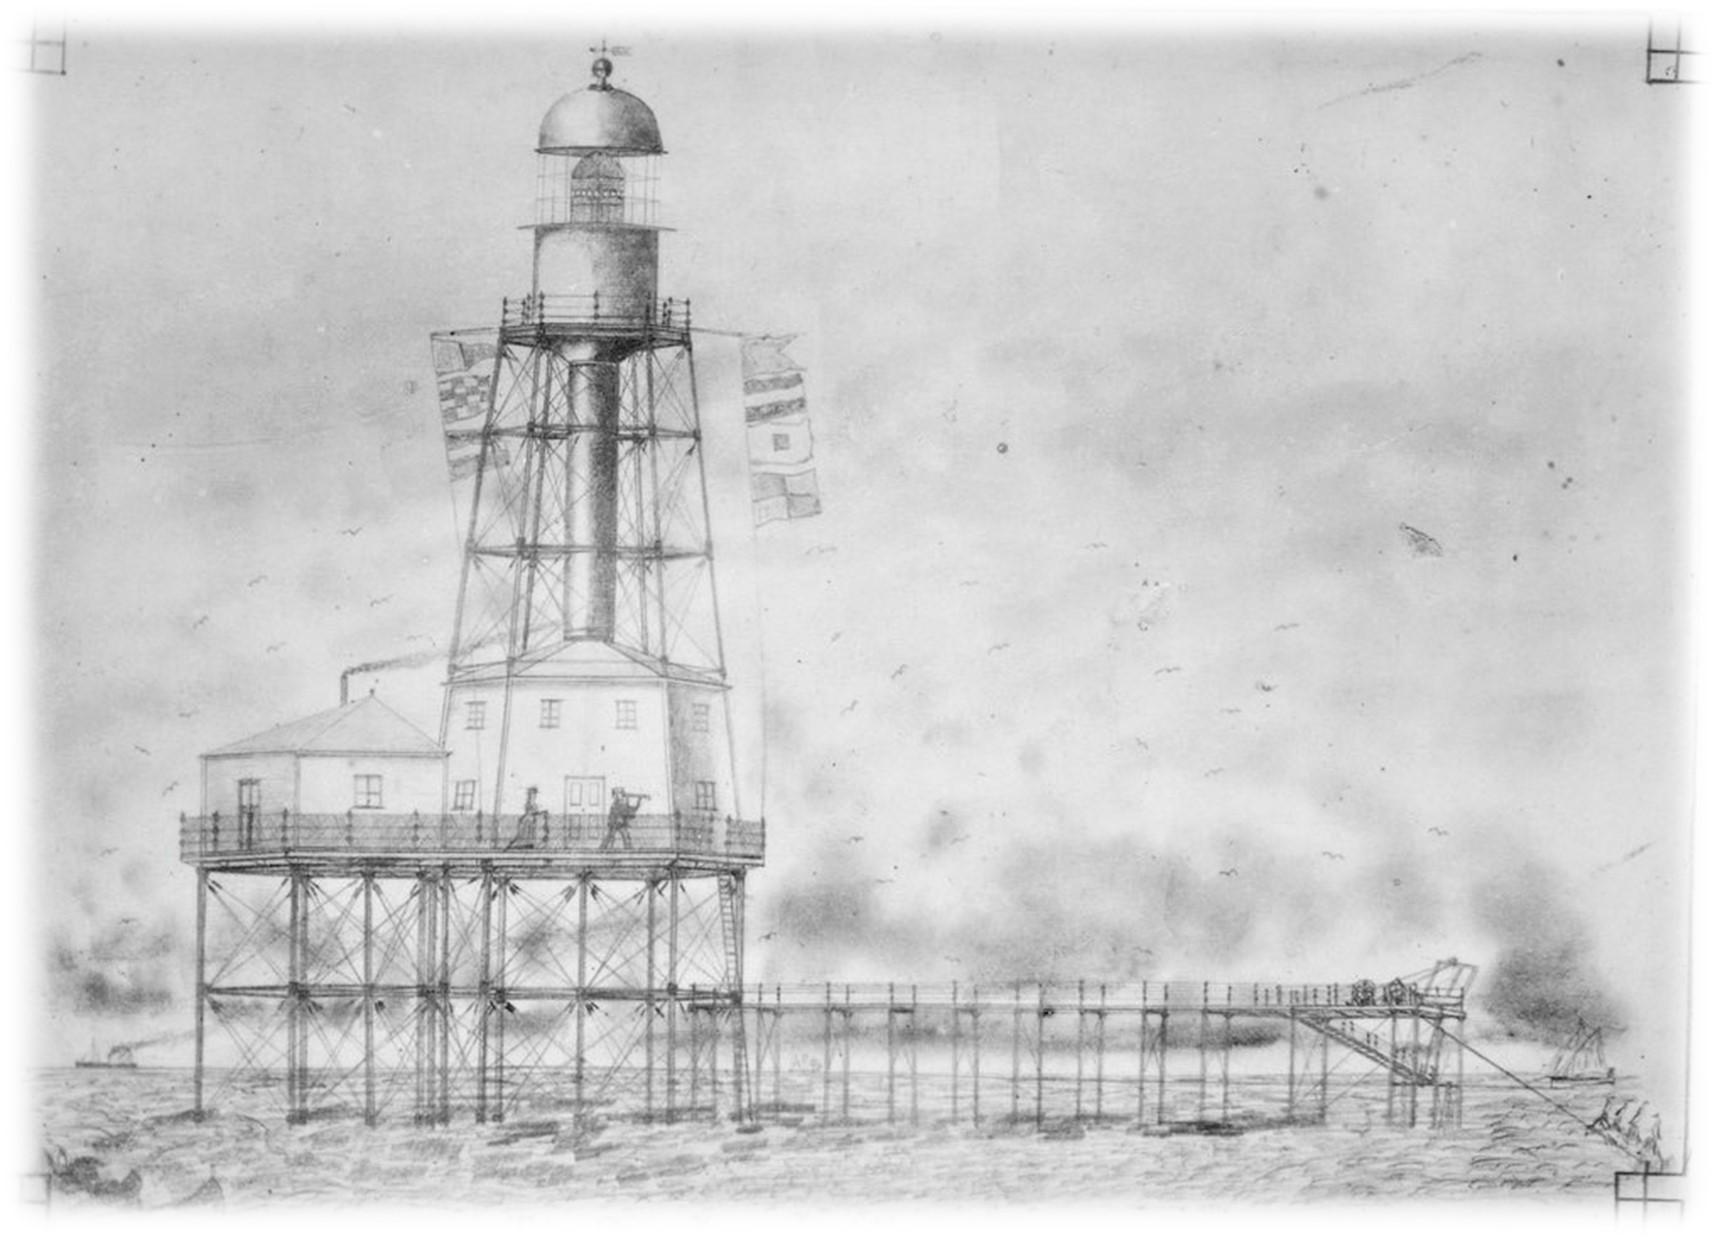 Artists Impression of Cape Jaffa Lighthouse